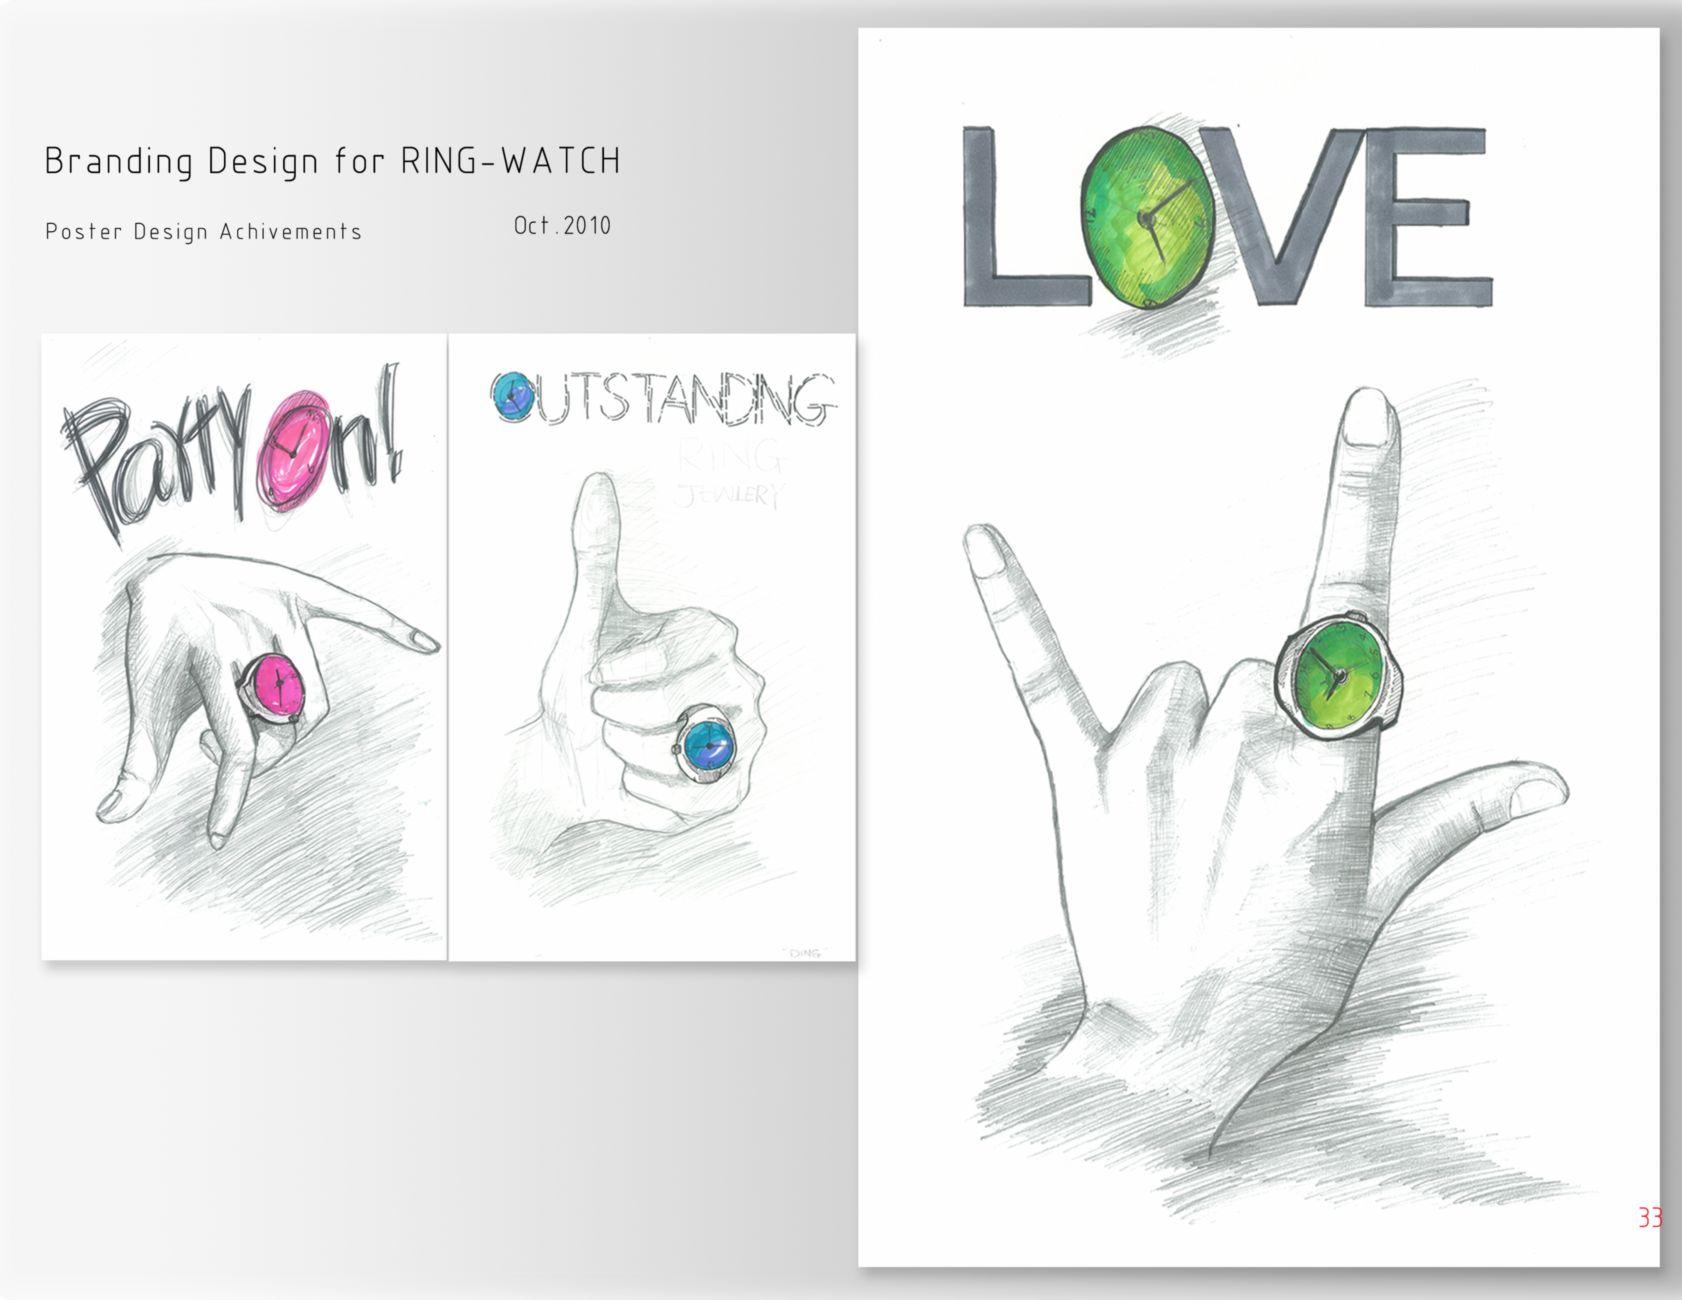 Watch Poster Design Poster Design Ring-watch